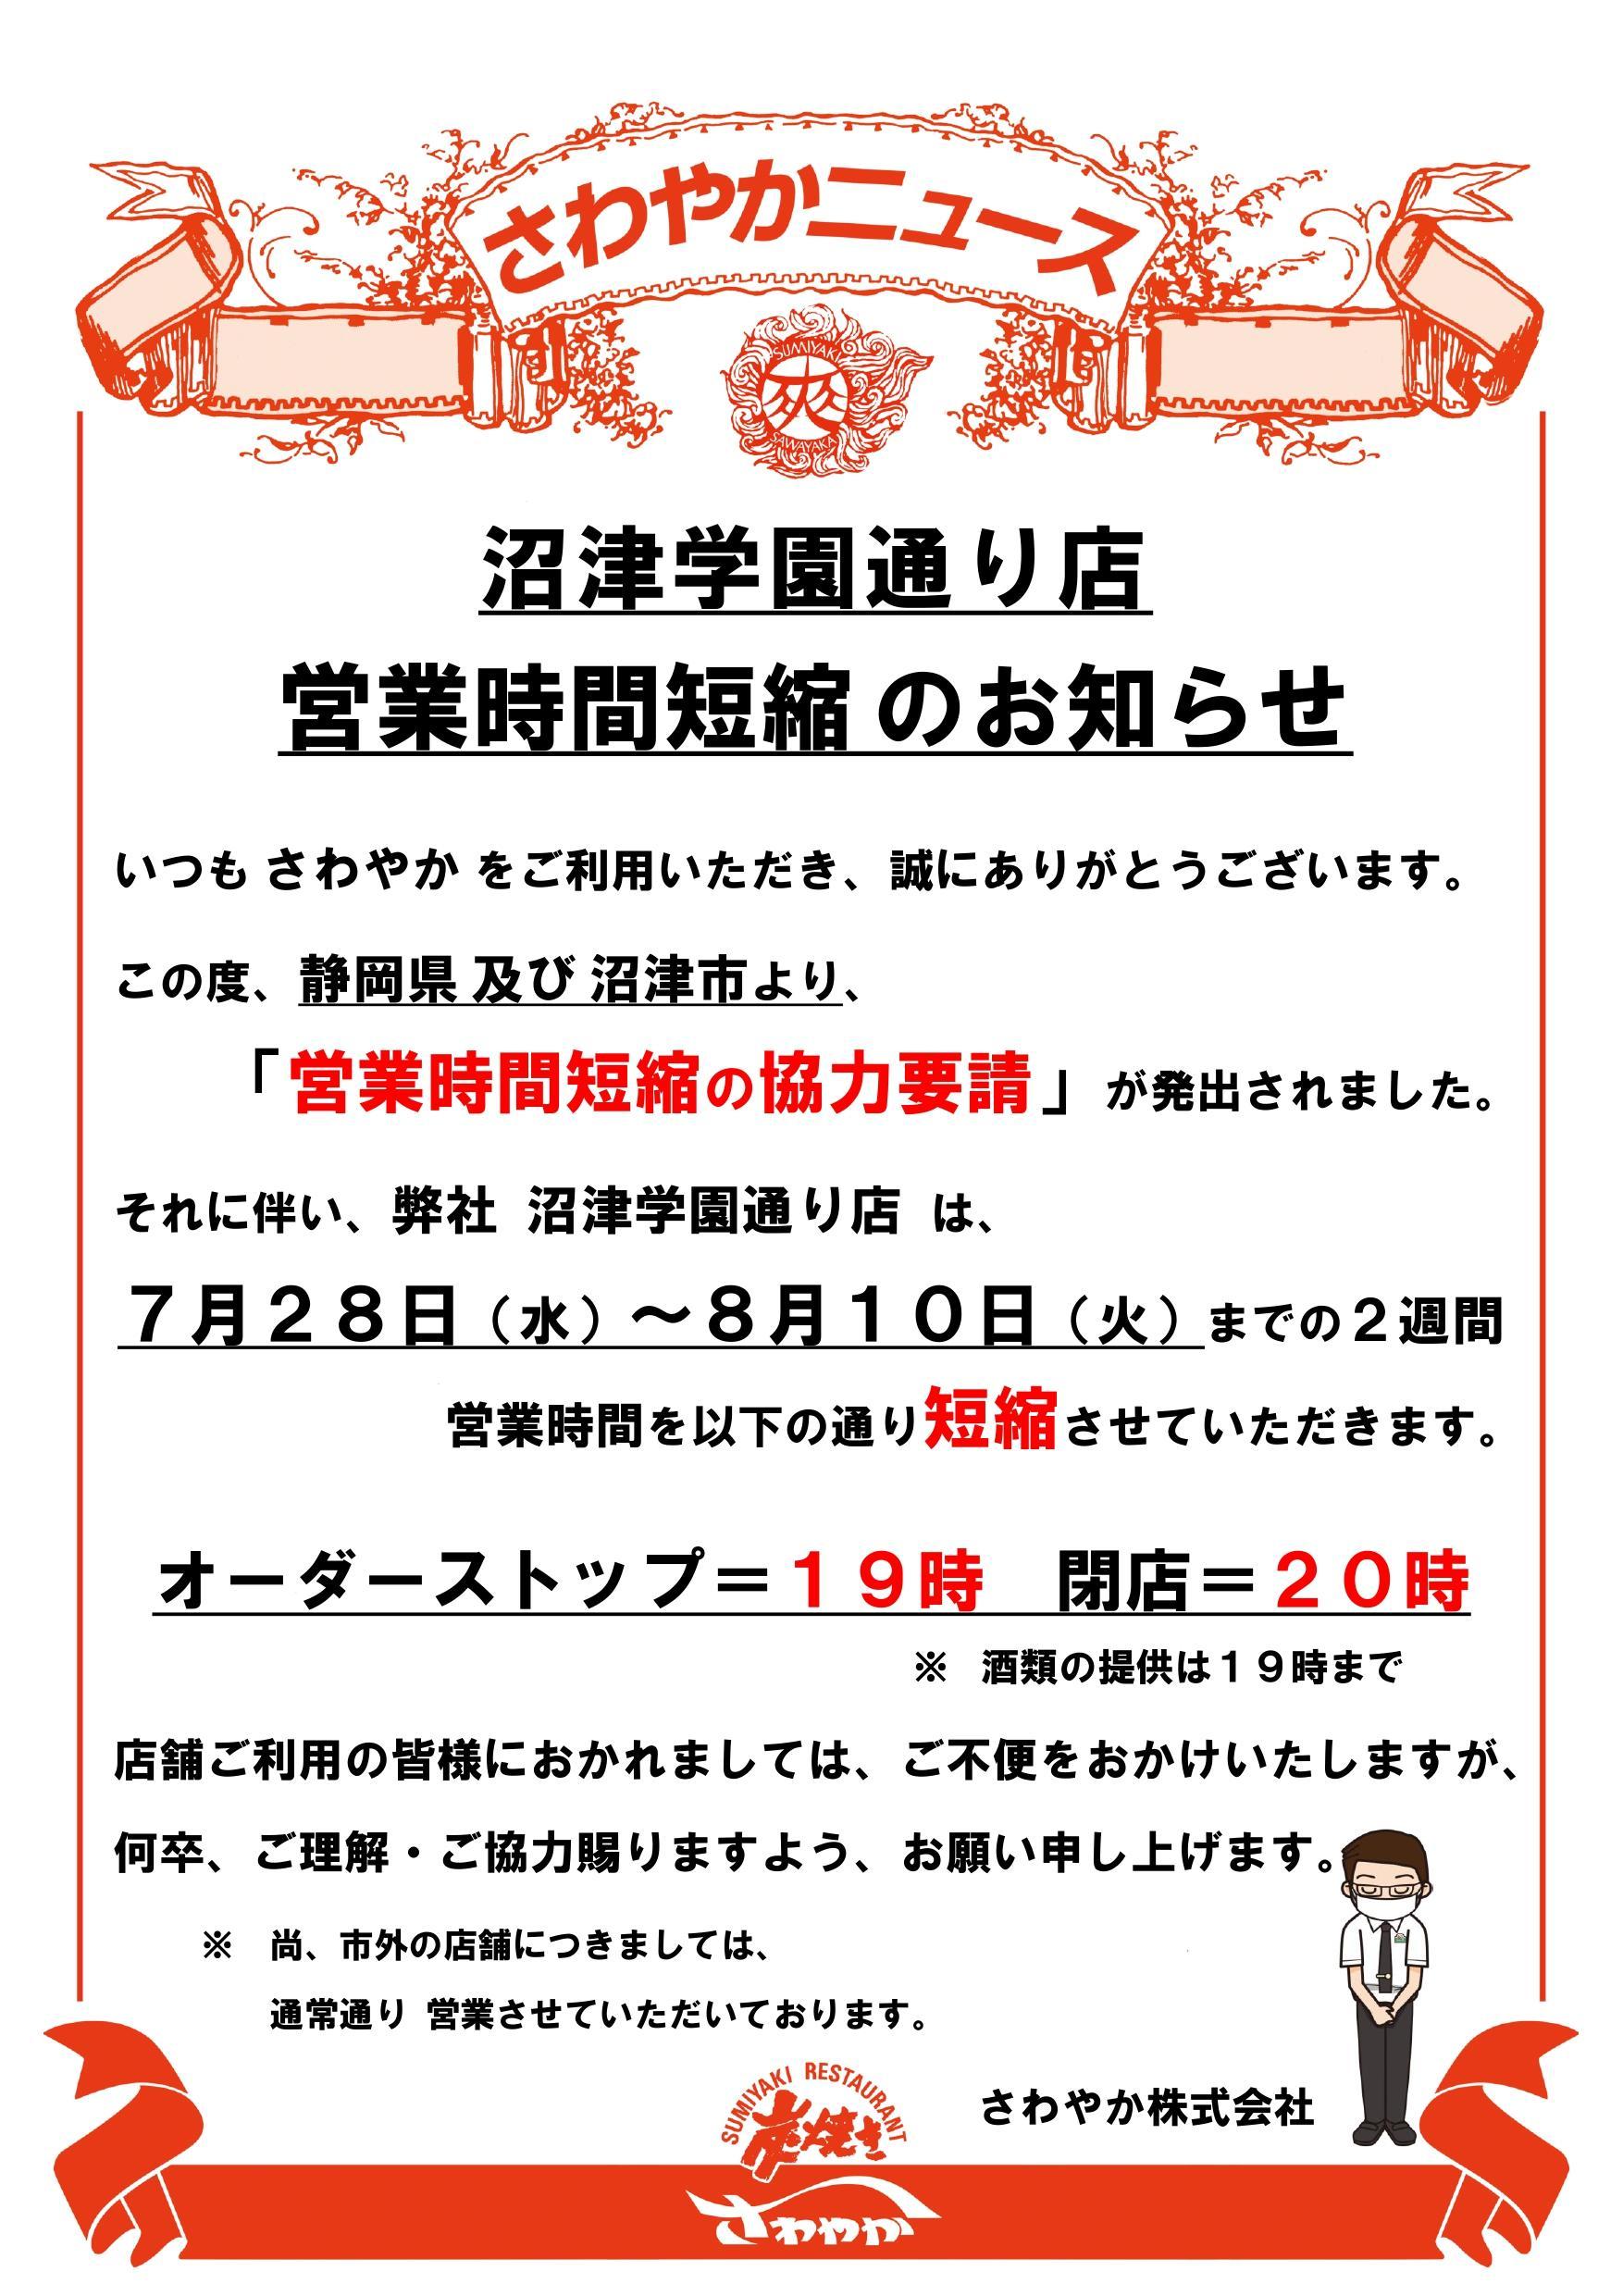 沼津 2021.07.28_page-0001 (2).jpg